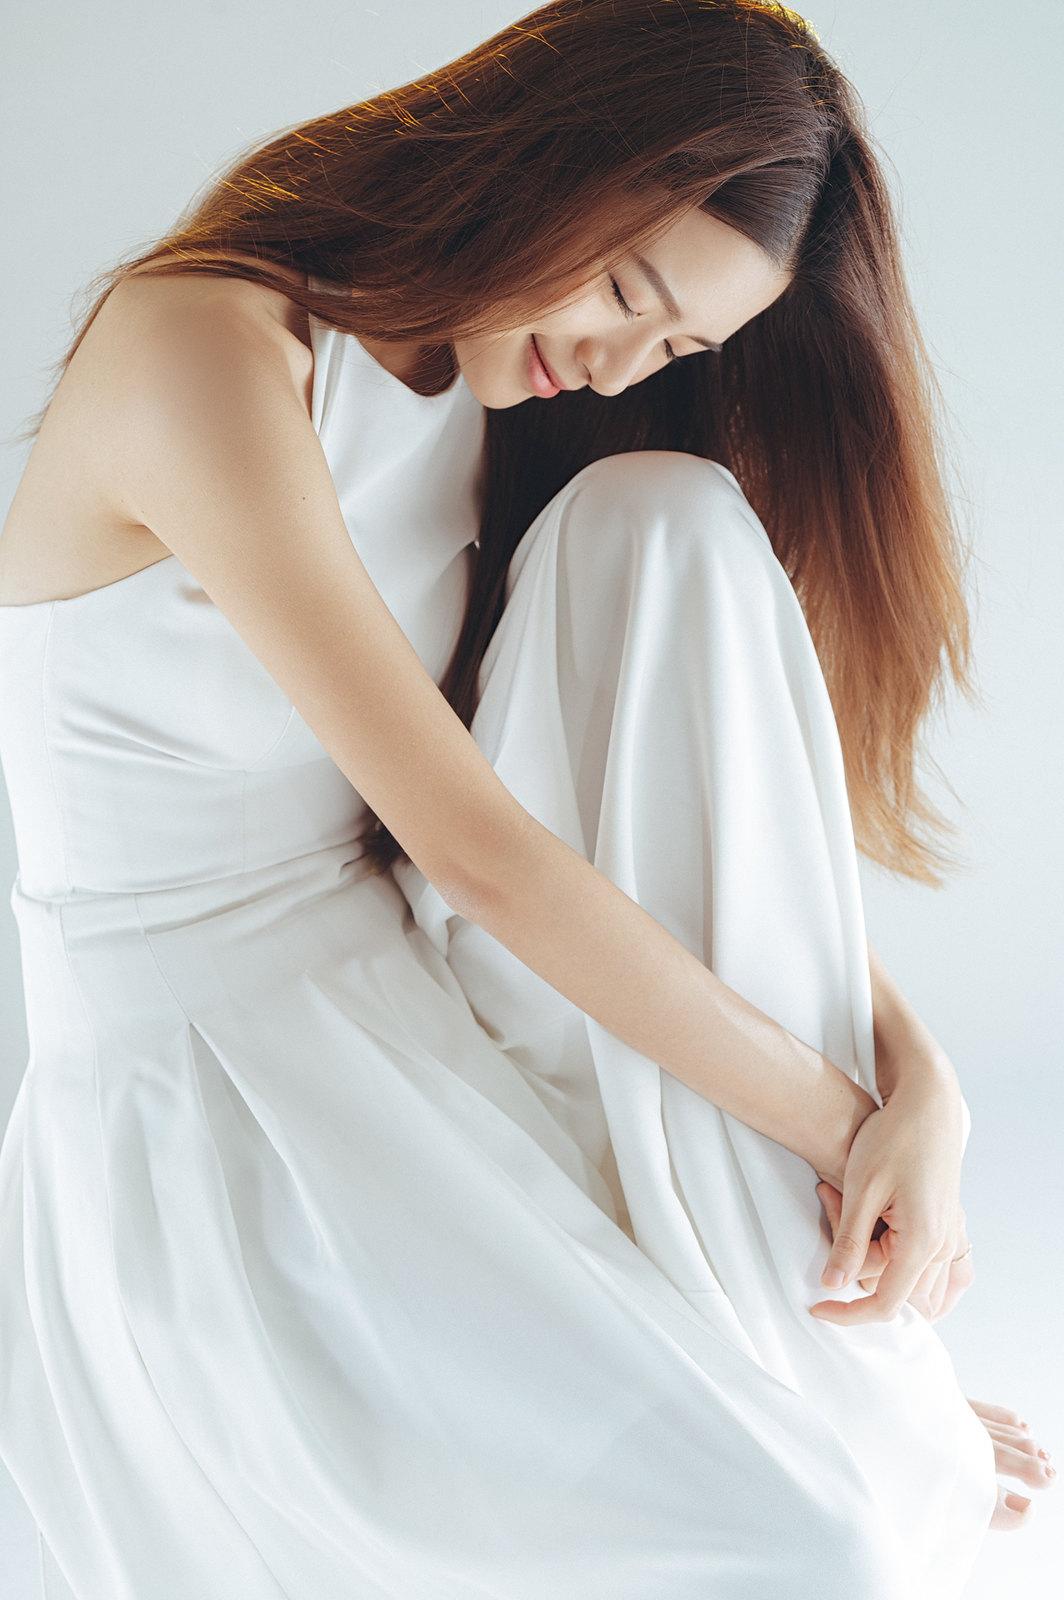 【人像攝影】Laihsin 賴心翎 / EASTERN WEDDING studio